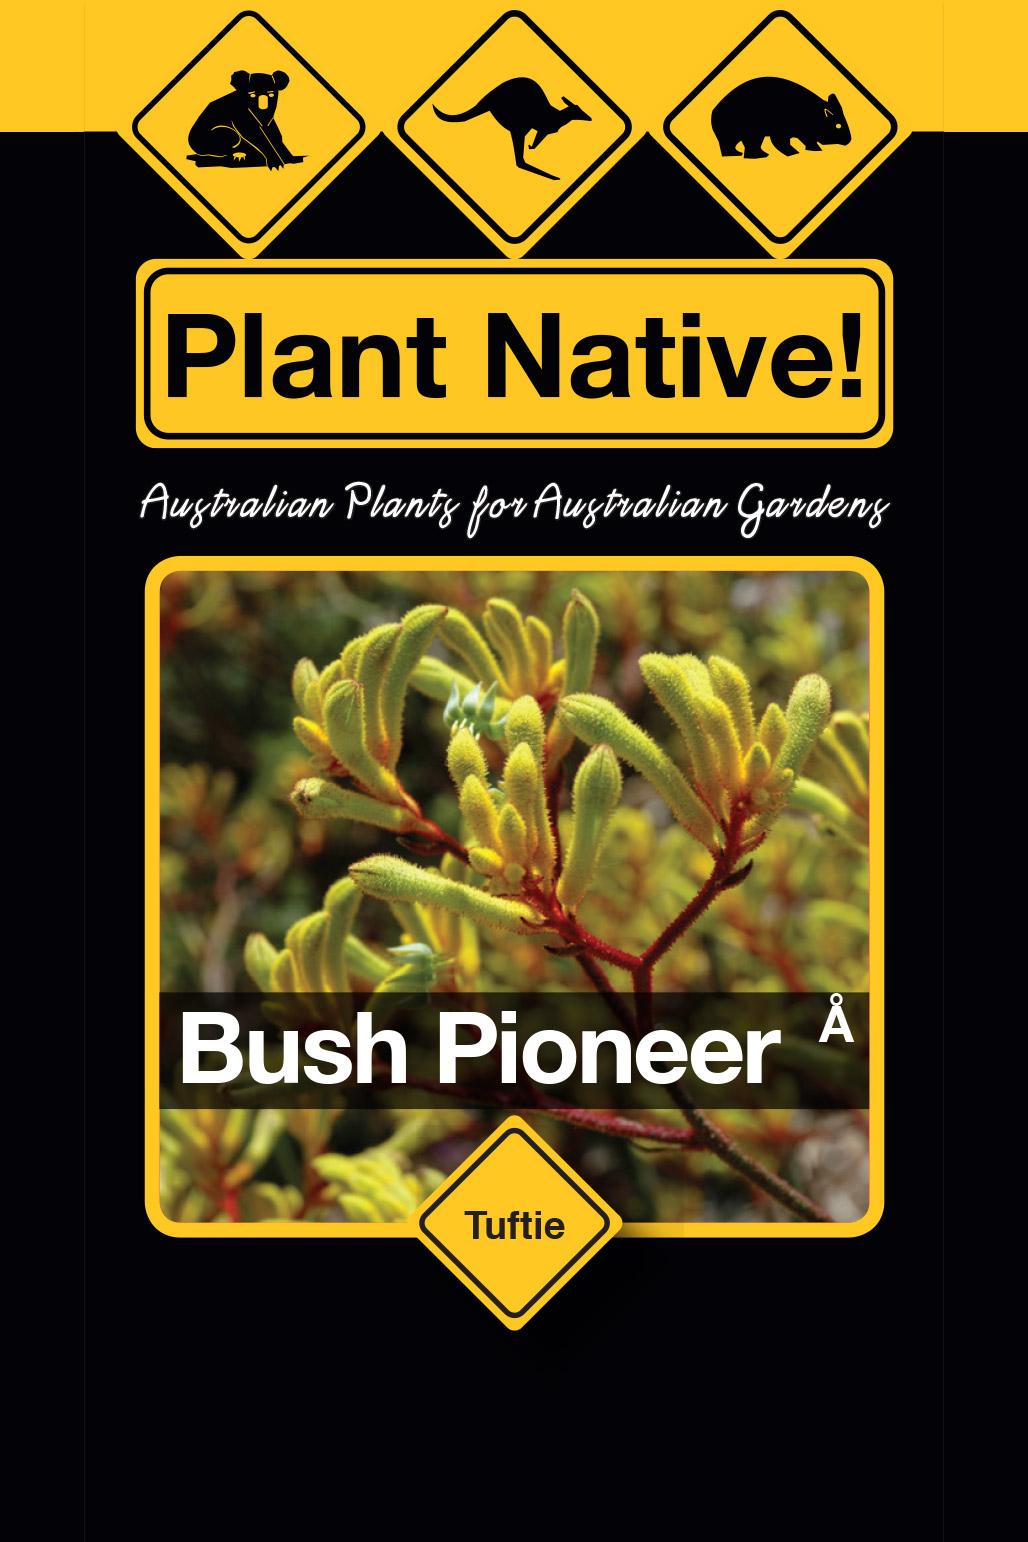 Bush Pioneer - Plant Native!